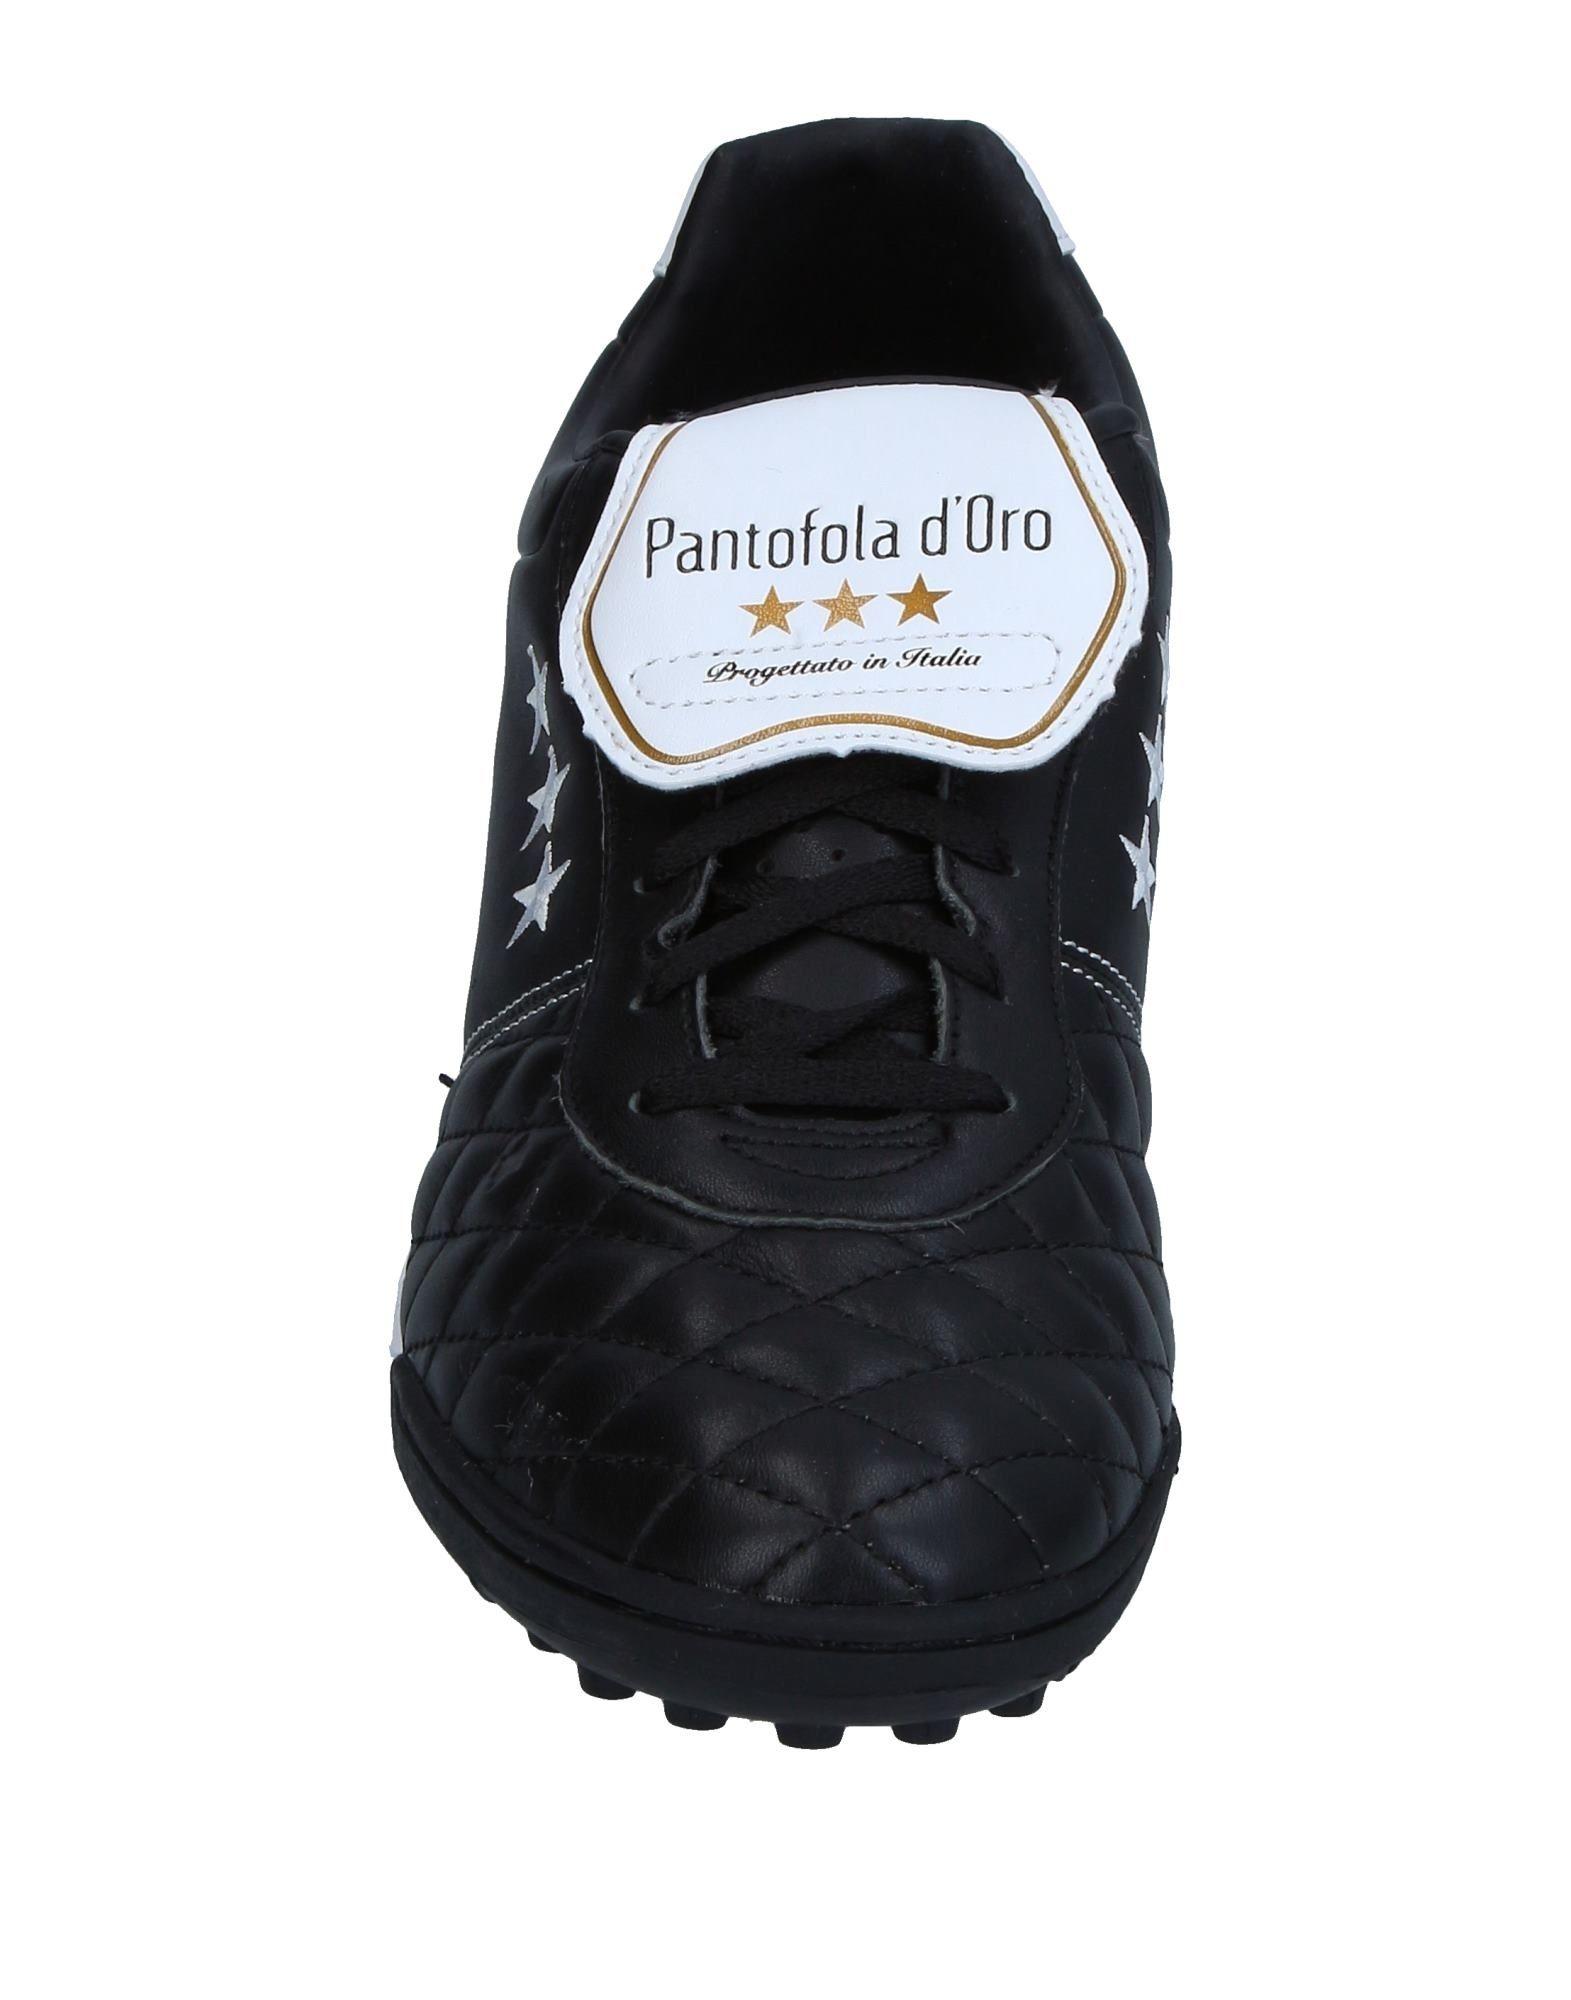 Pantofola D'oro Herren Sneakers Herren D'oro  11338571RM Neue Schuhe de8a8b